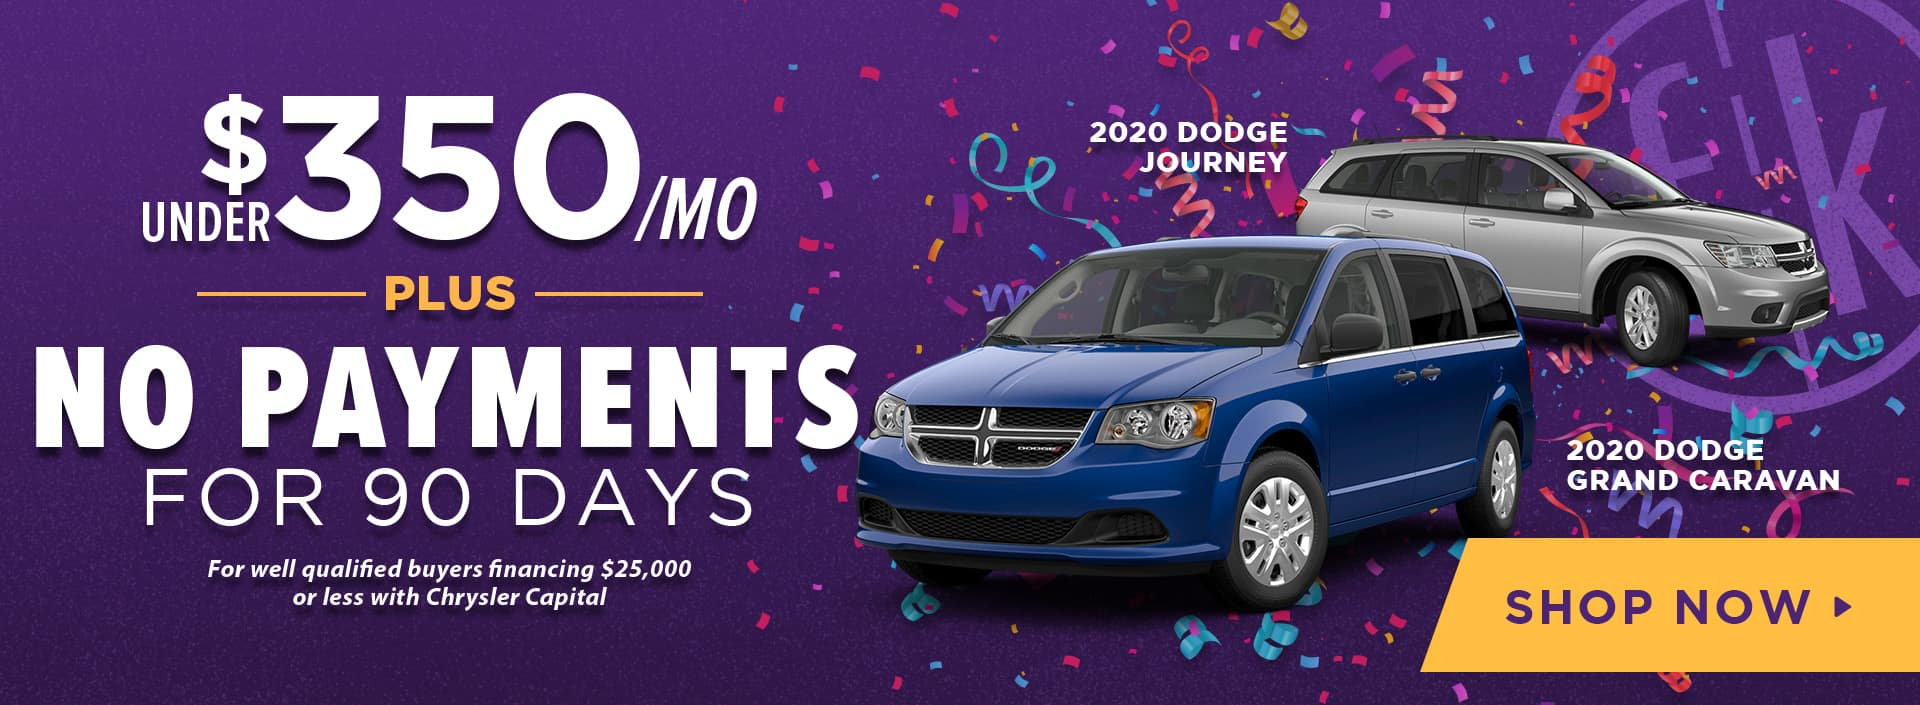 Under $350/ mo PLUS No Payments for 90 Days 2020 Dodge Journey & Grand Caravan